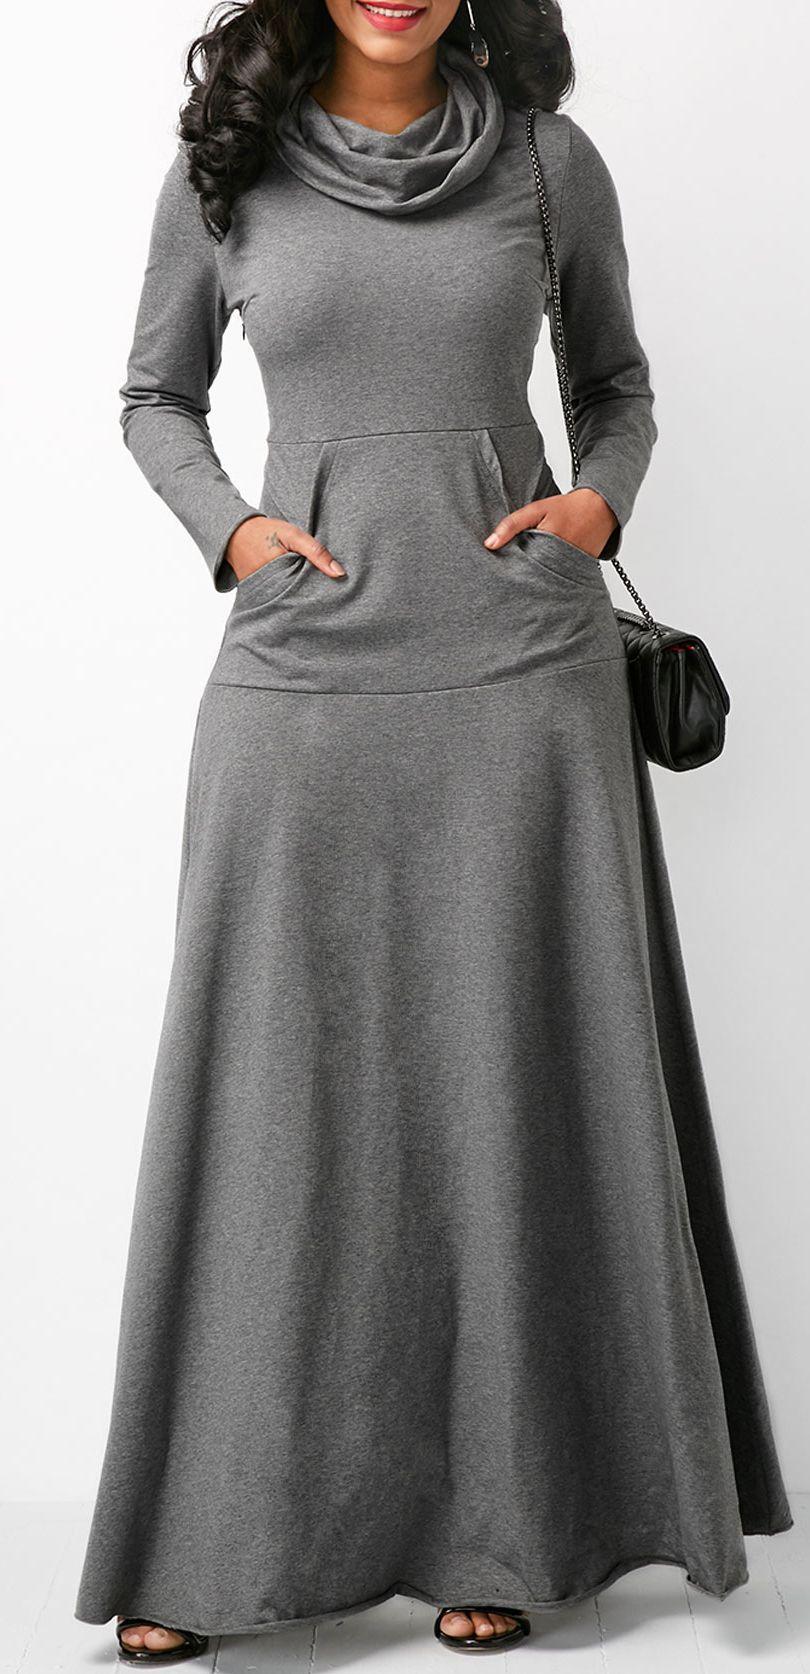 Grey Long Sleeve Cowl Neck Maxi Dress.  1a3e29a6a0